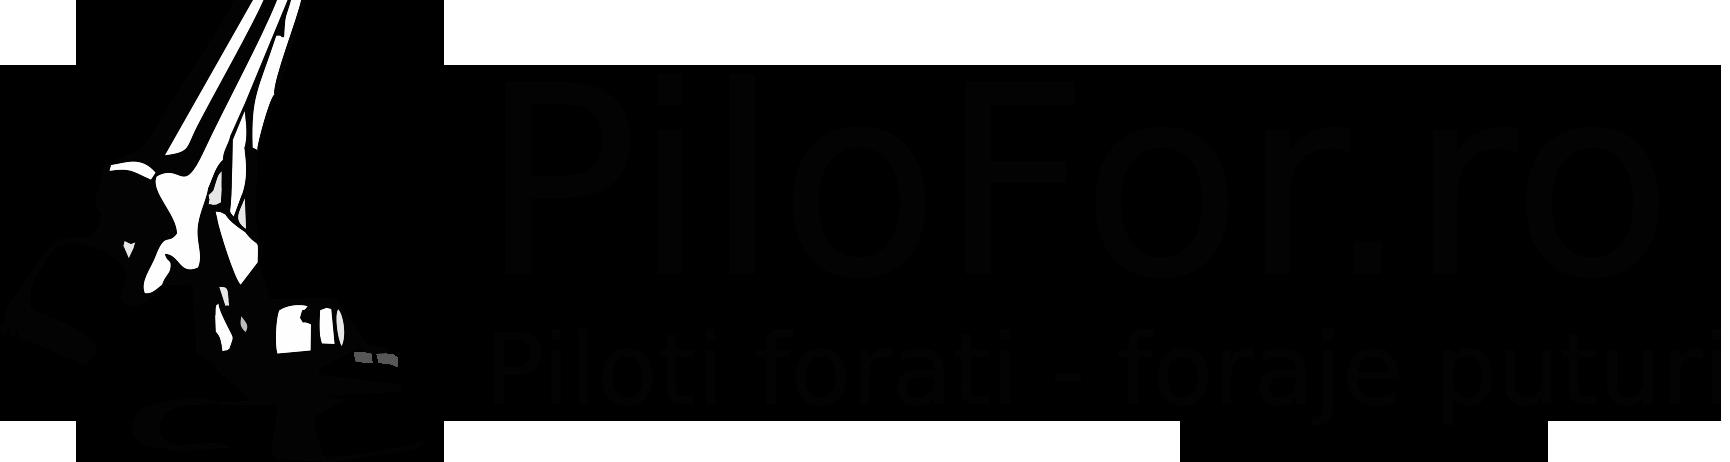 Pilofor